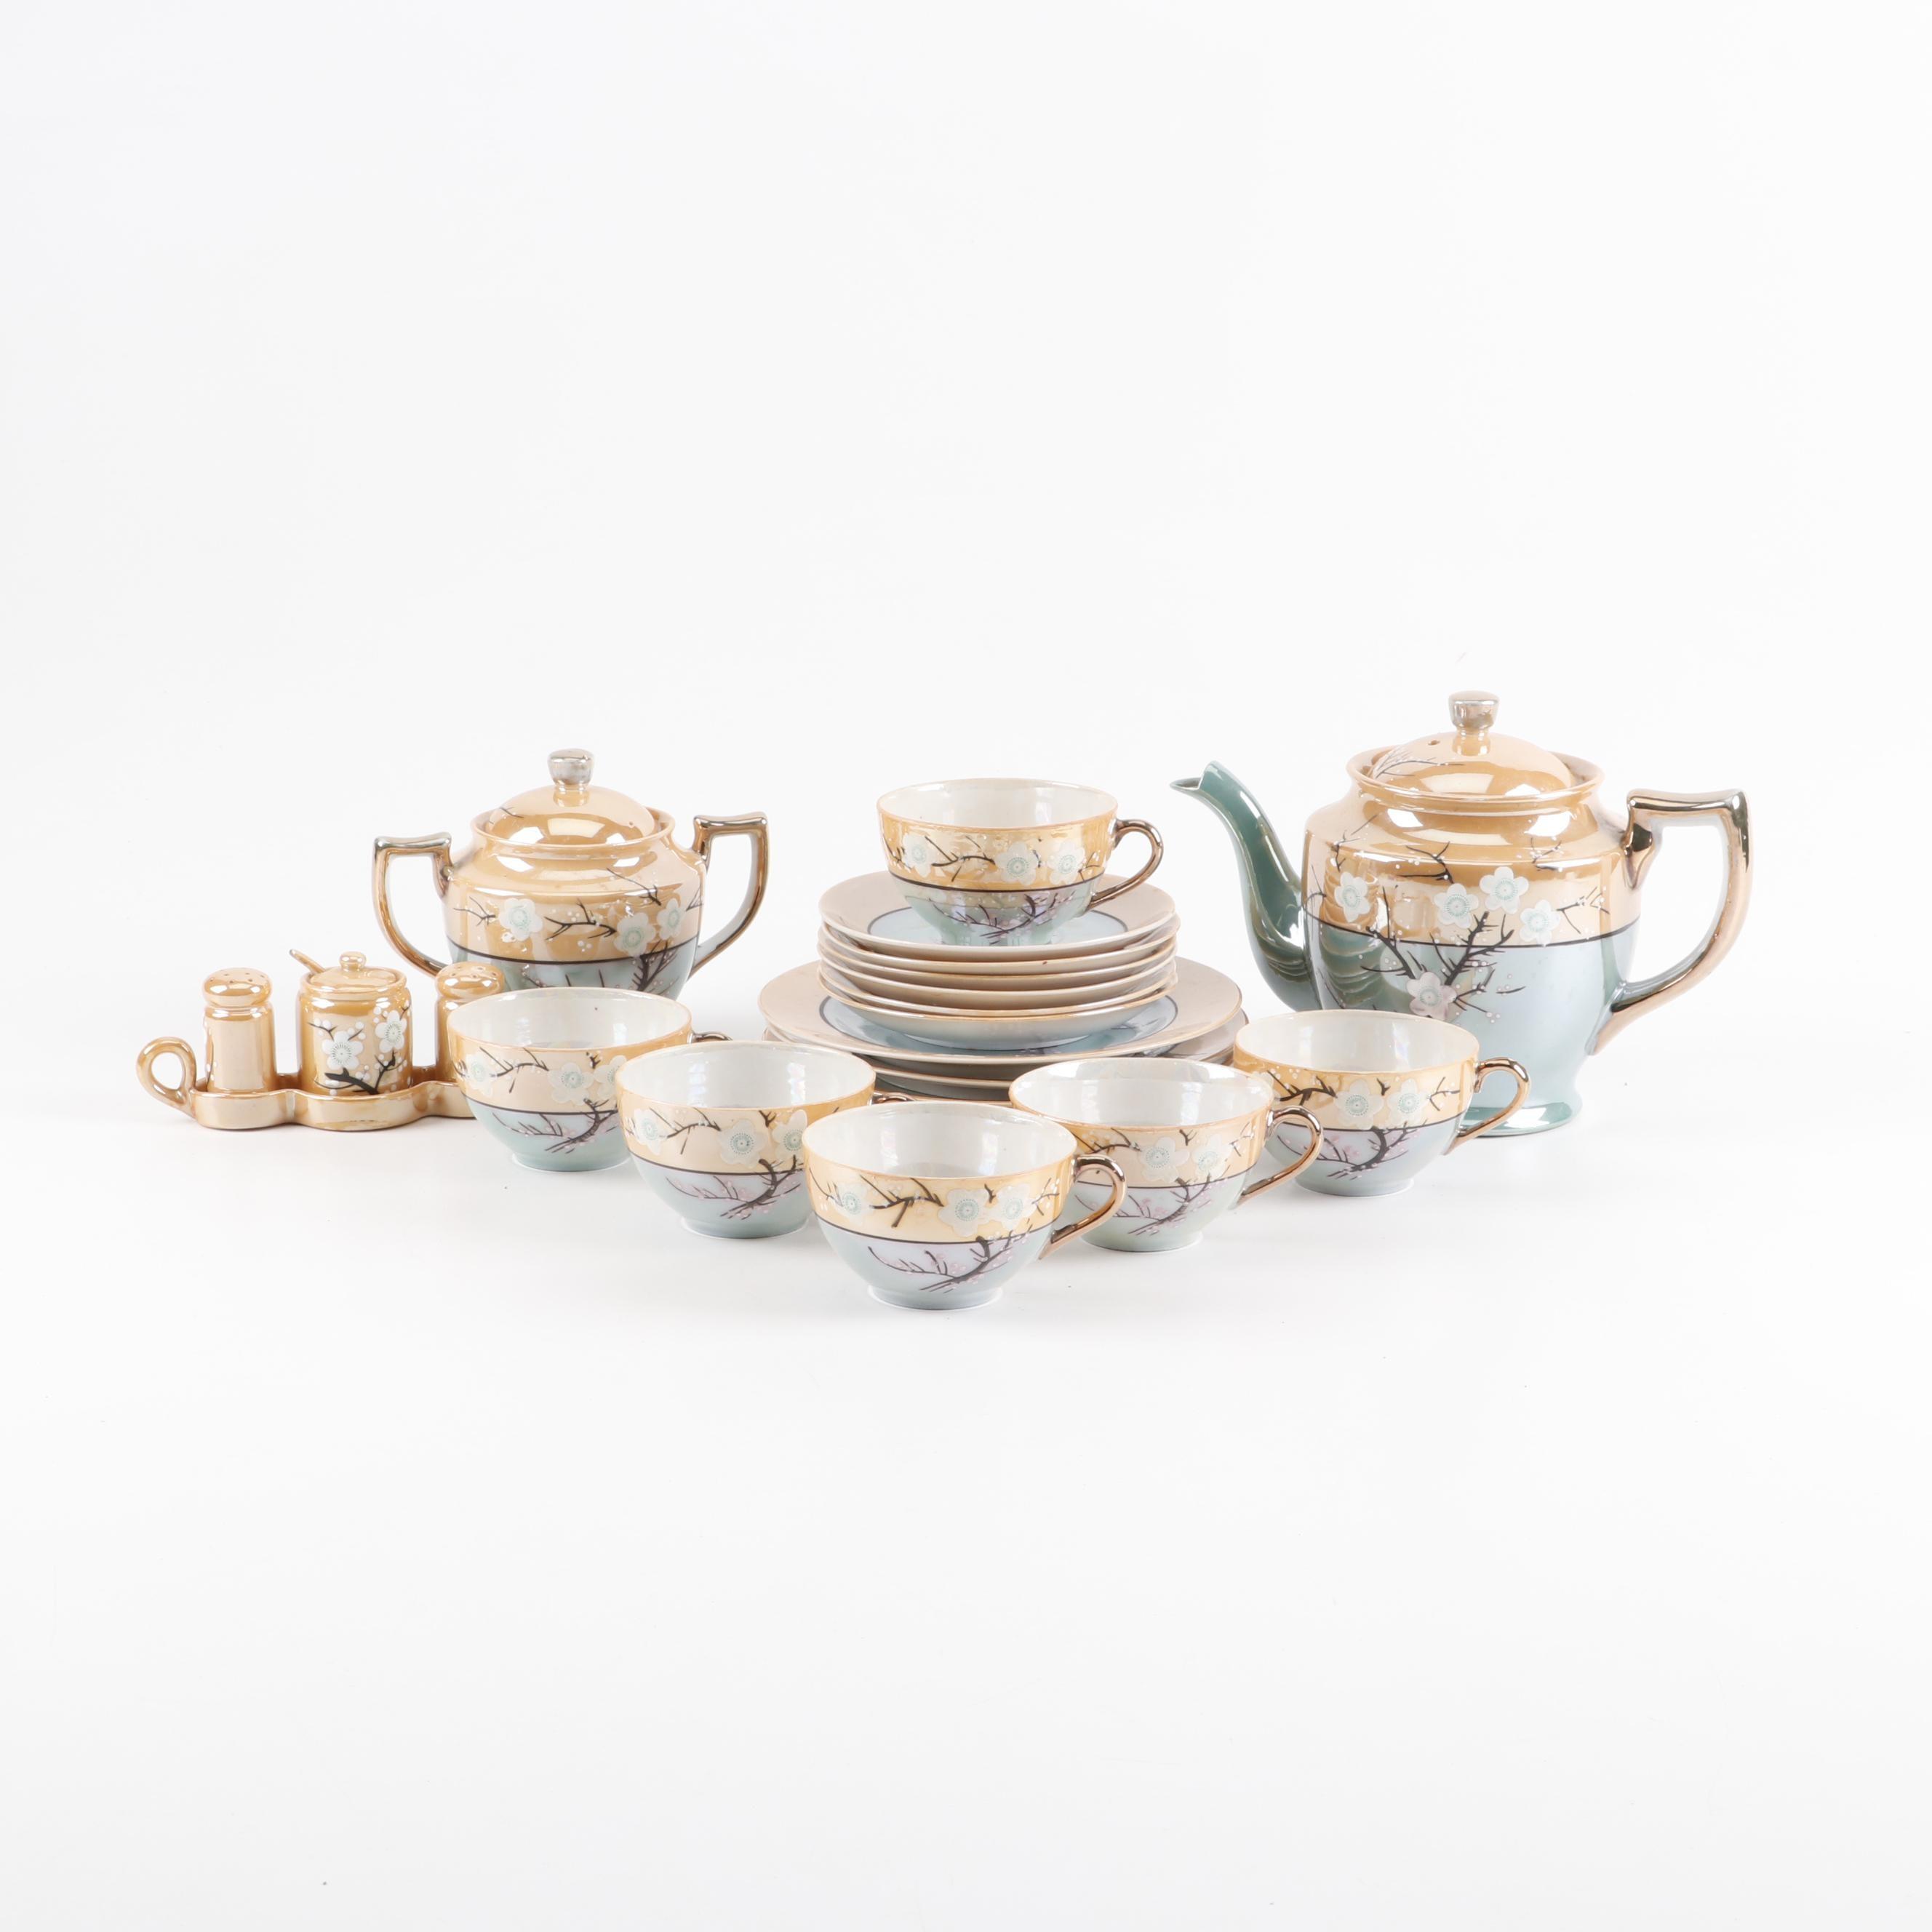 Japanese Ceramic Lusterware Tea Set and Serveware, Mid 20th Century